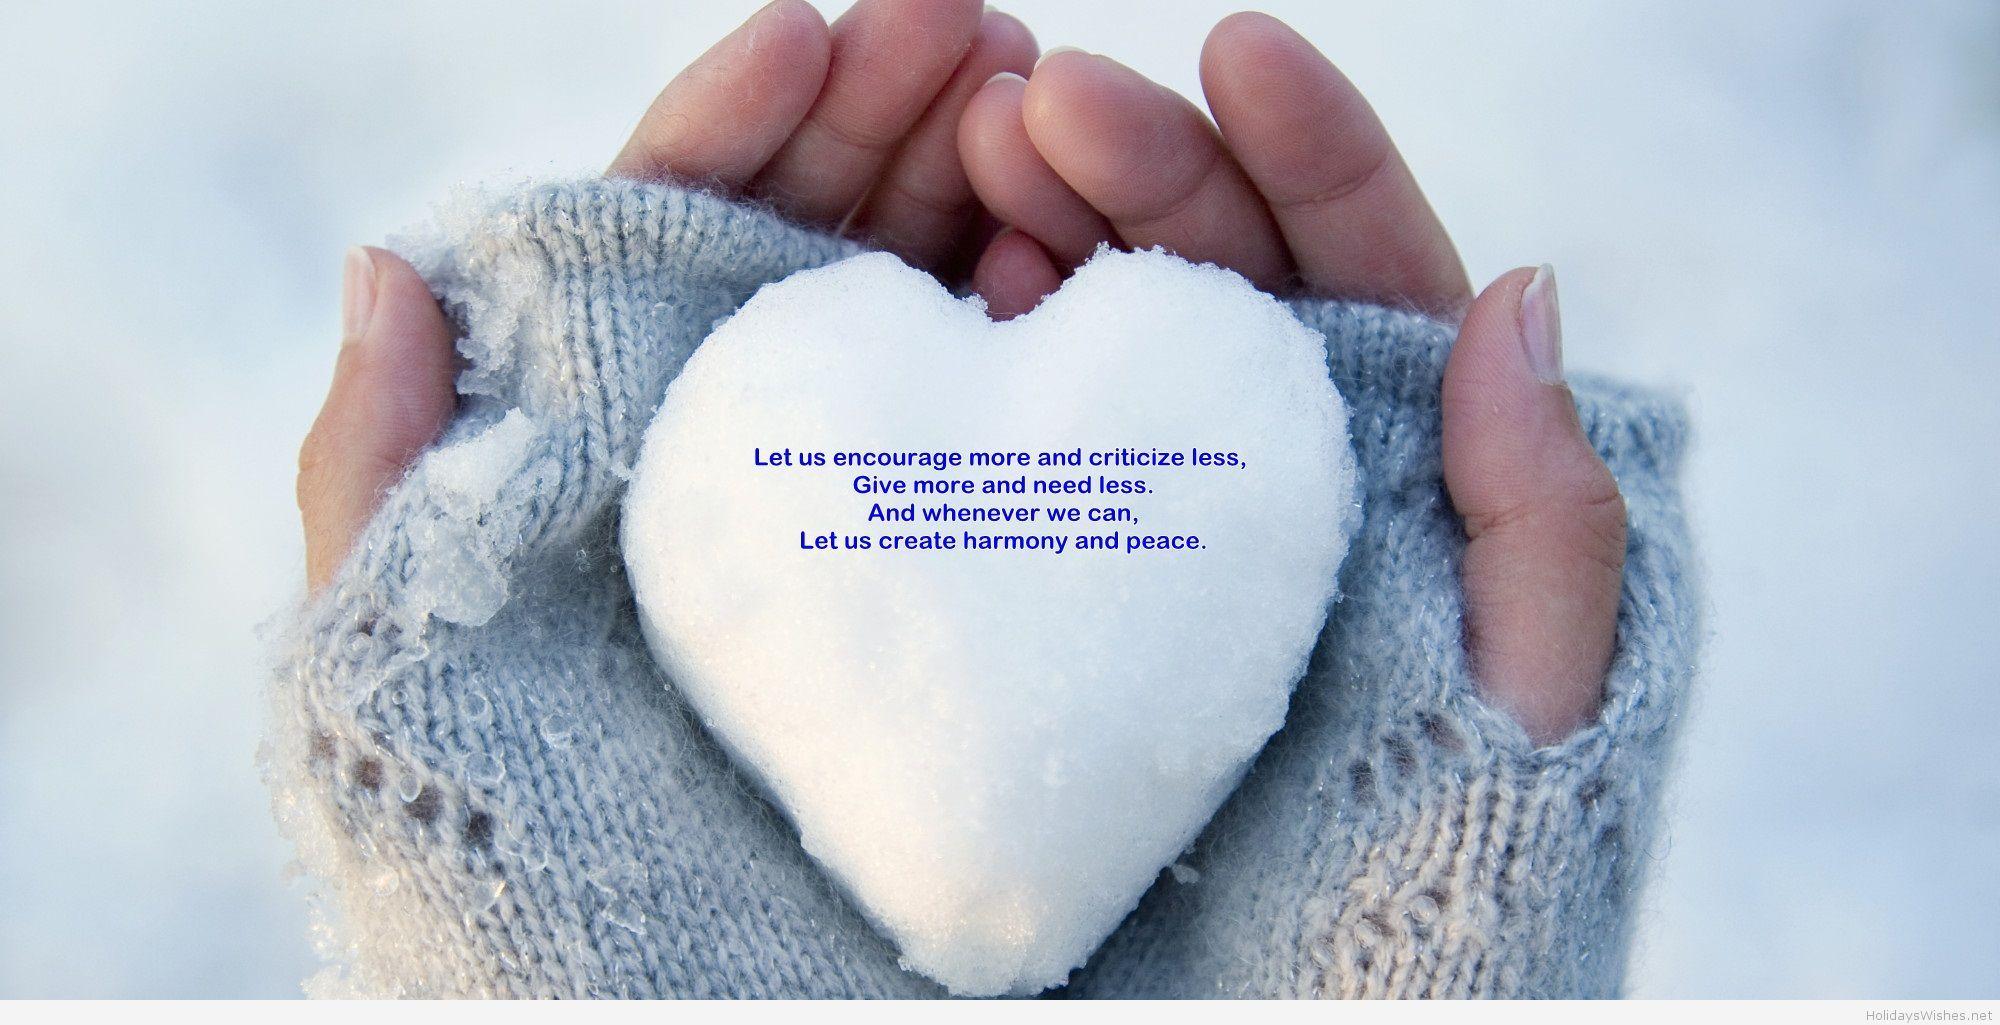 Love heart of snow happy new year 2015